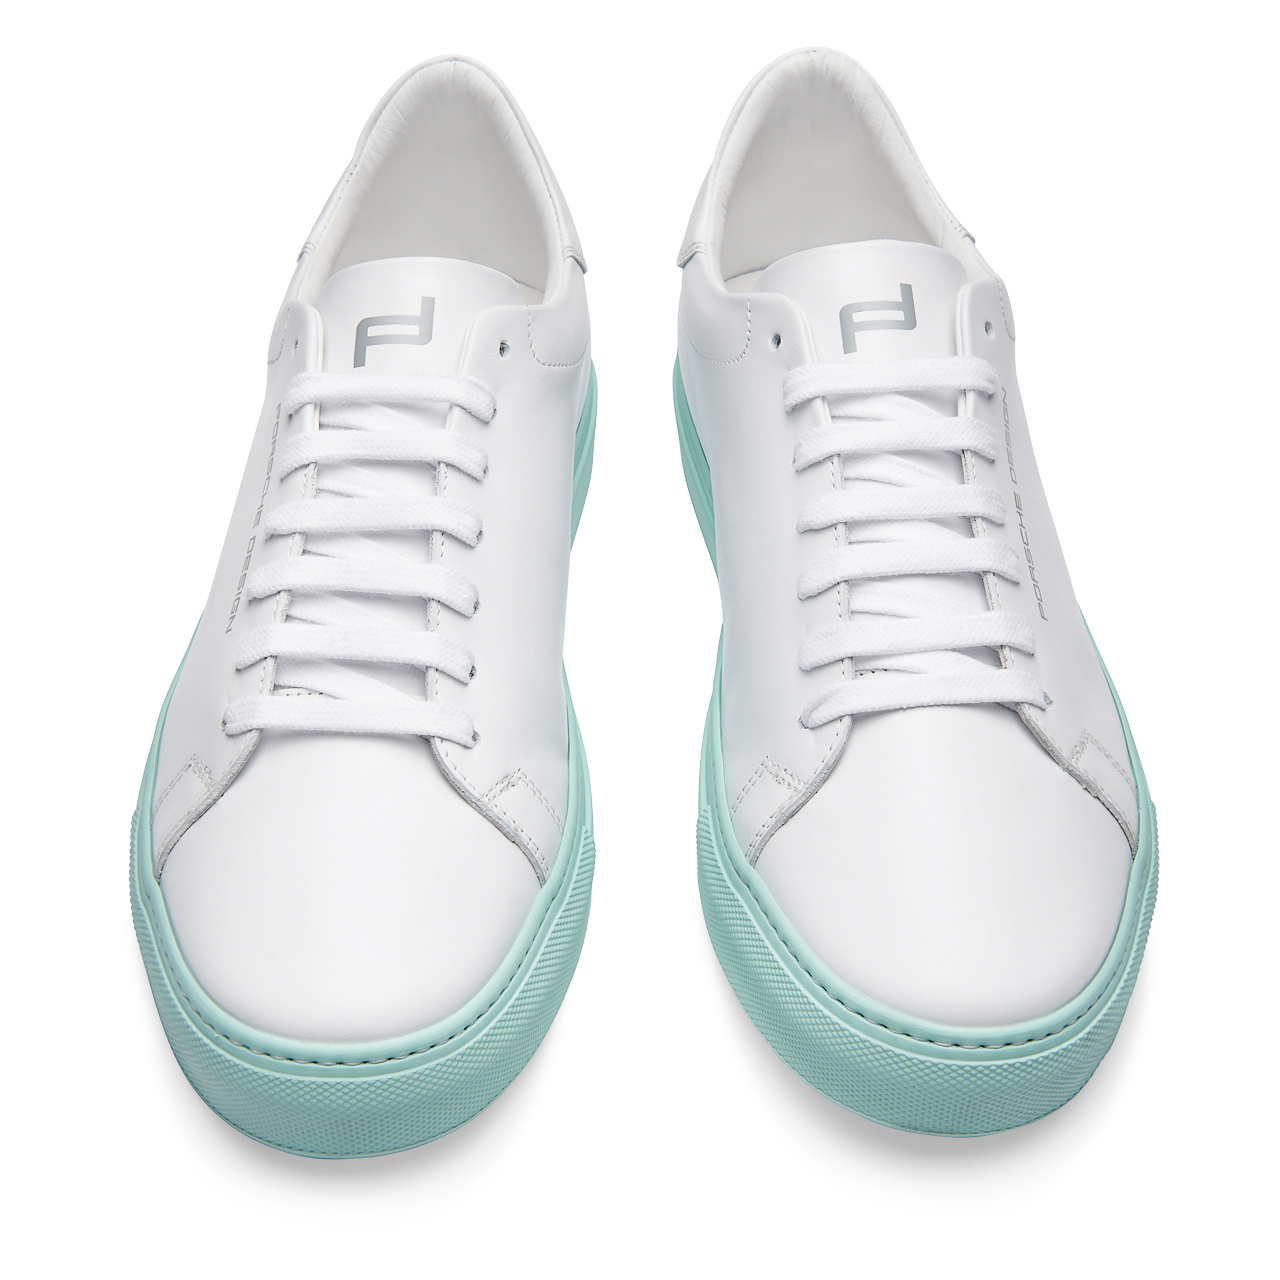 Cupsole Calf Sneaker - Shoes   Porsche